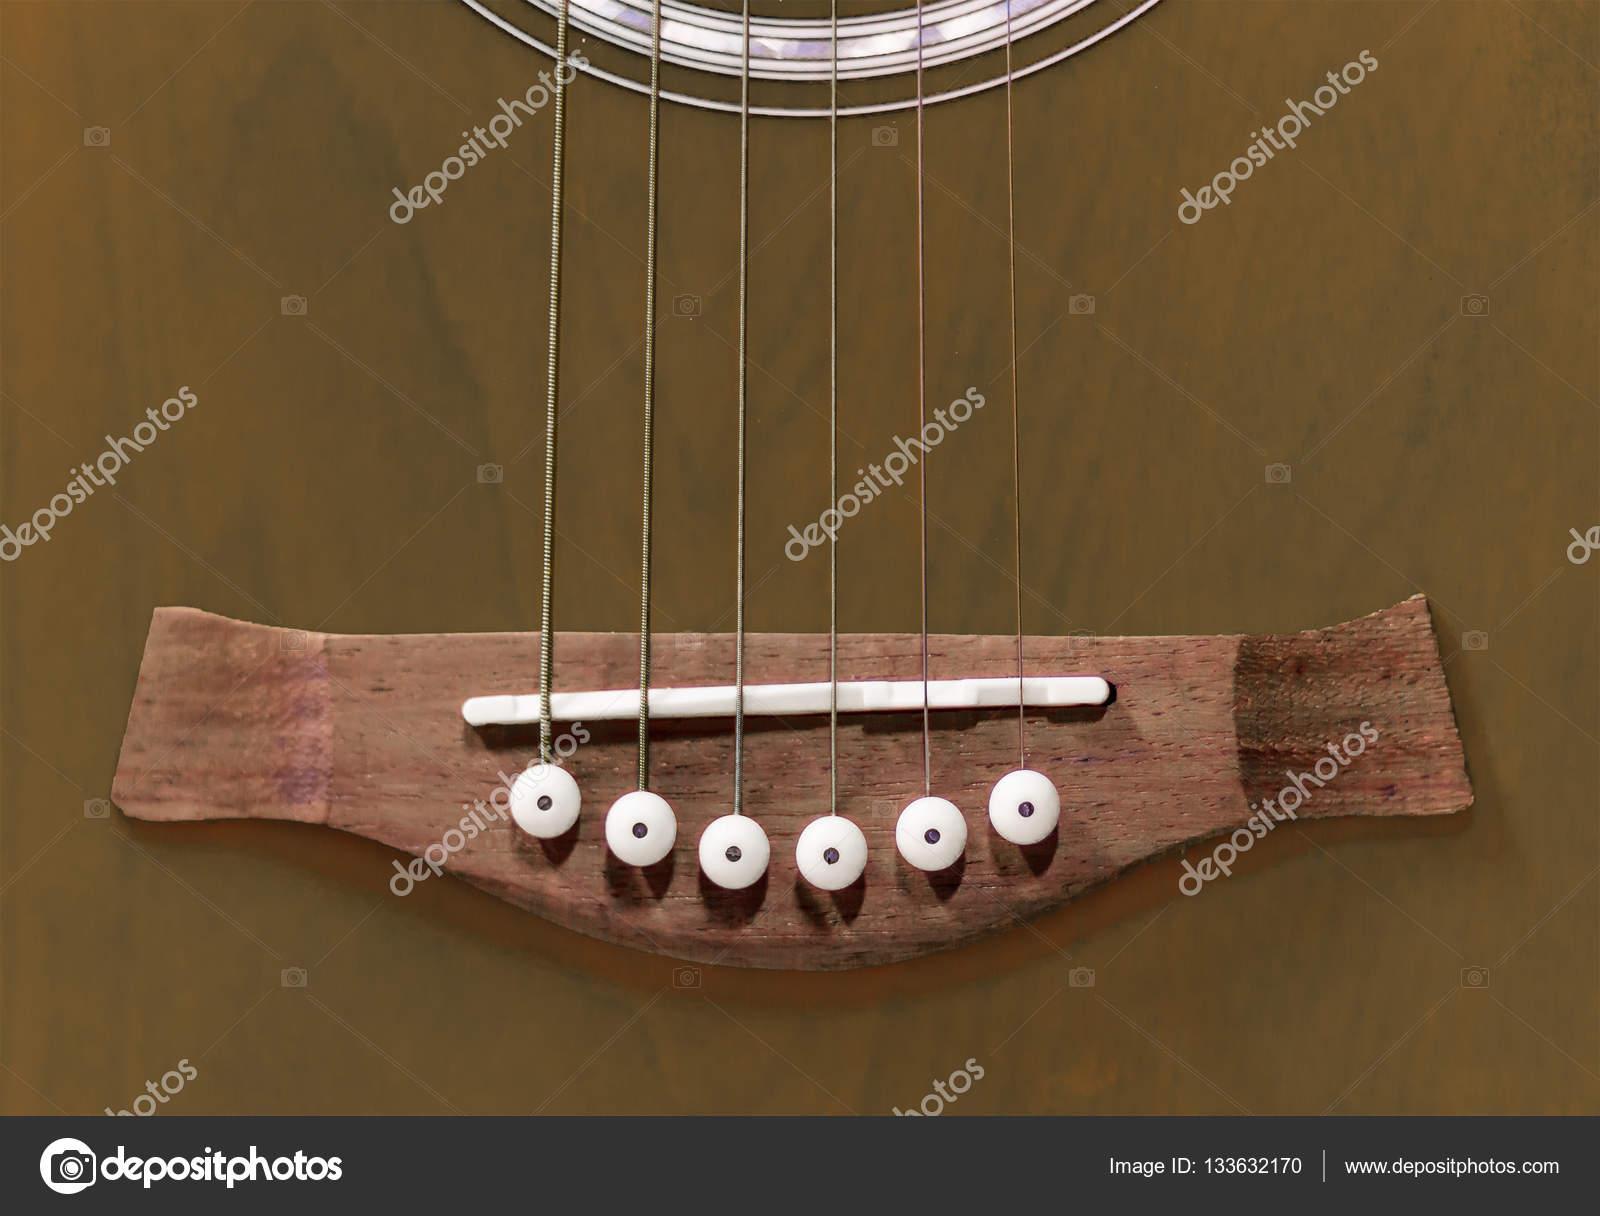 Acoustic Guitar Bridge With Saddle Bridge Pins And Strings Stock